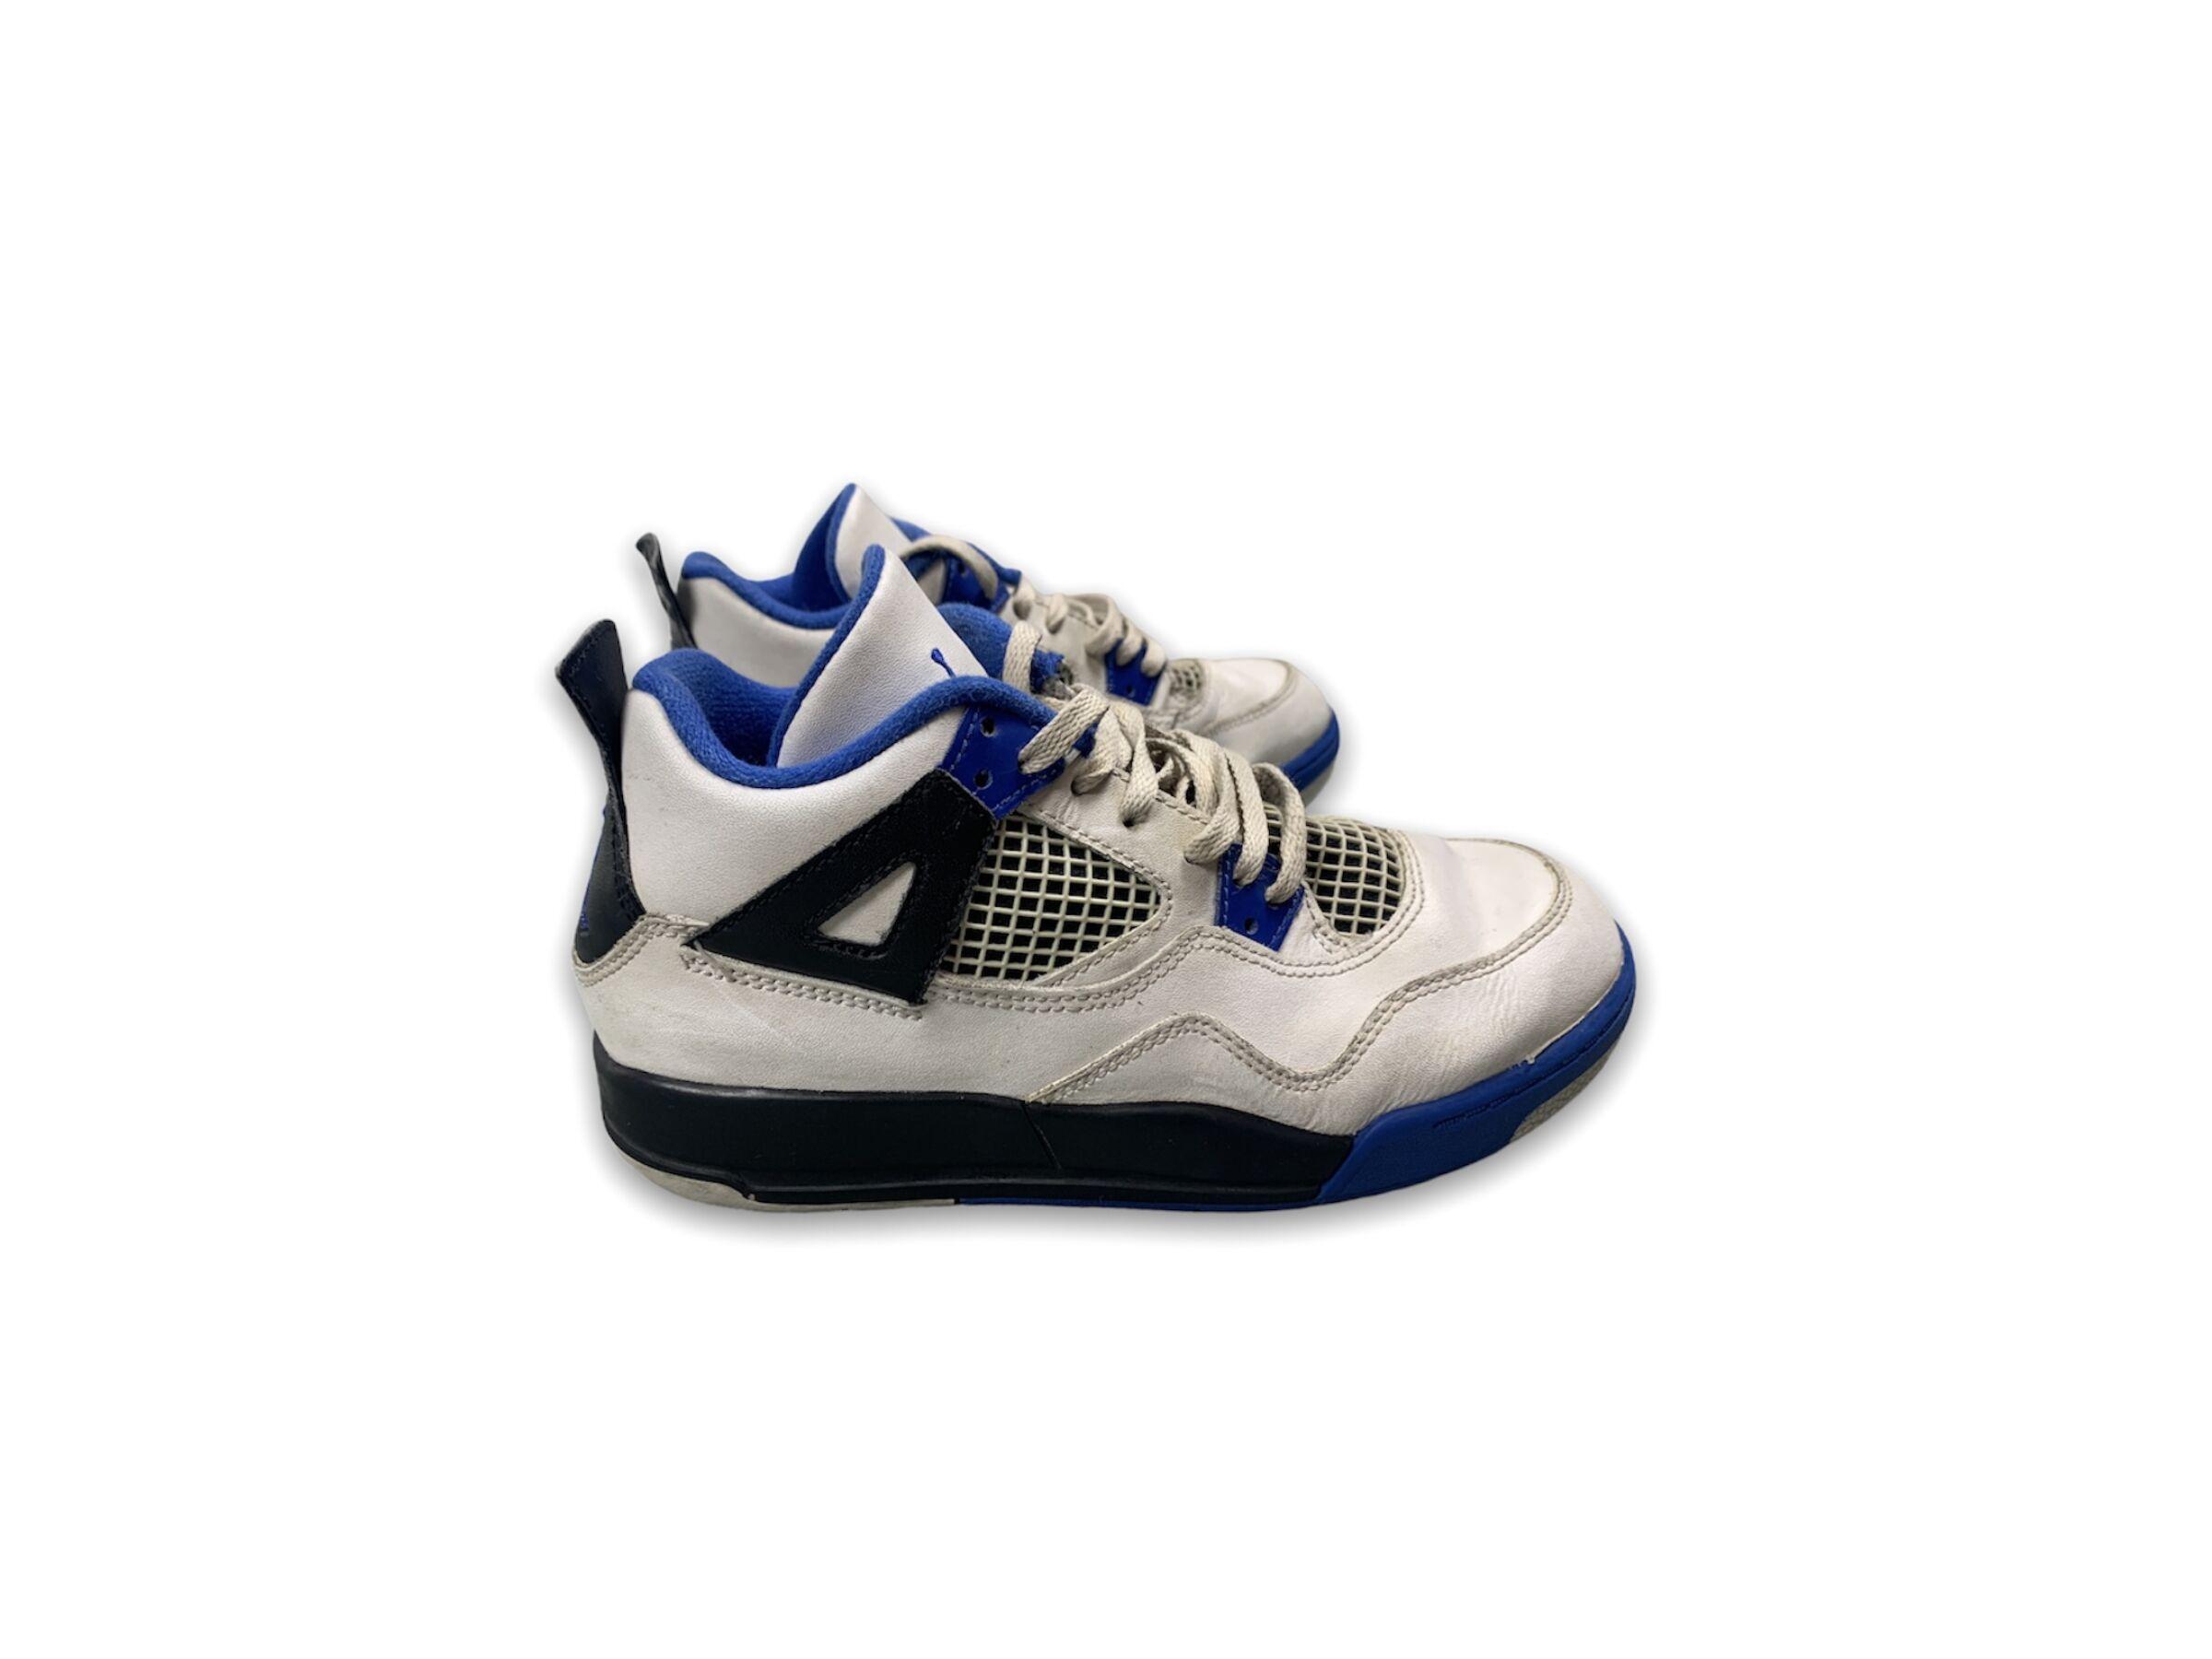 Aird Jordan Retro 4 Motorsport cipő (33,5)